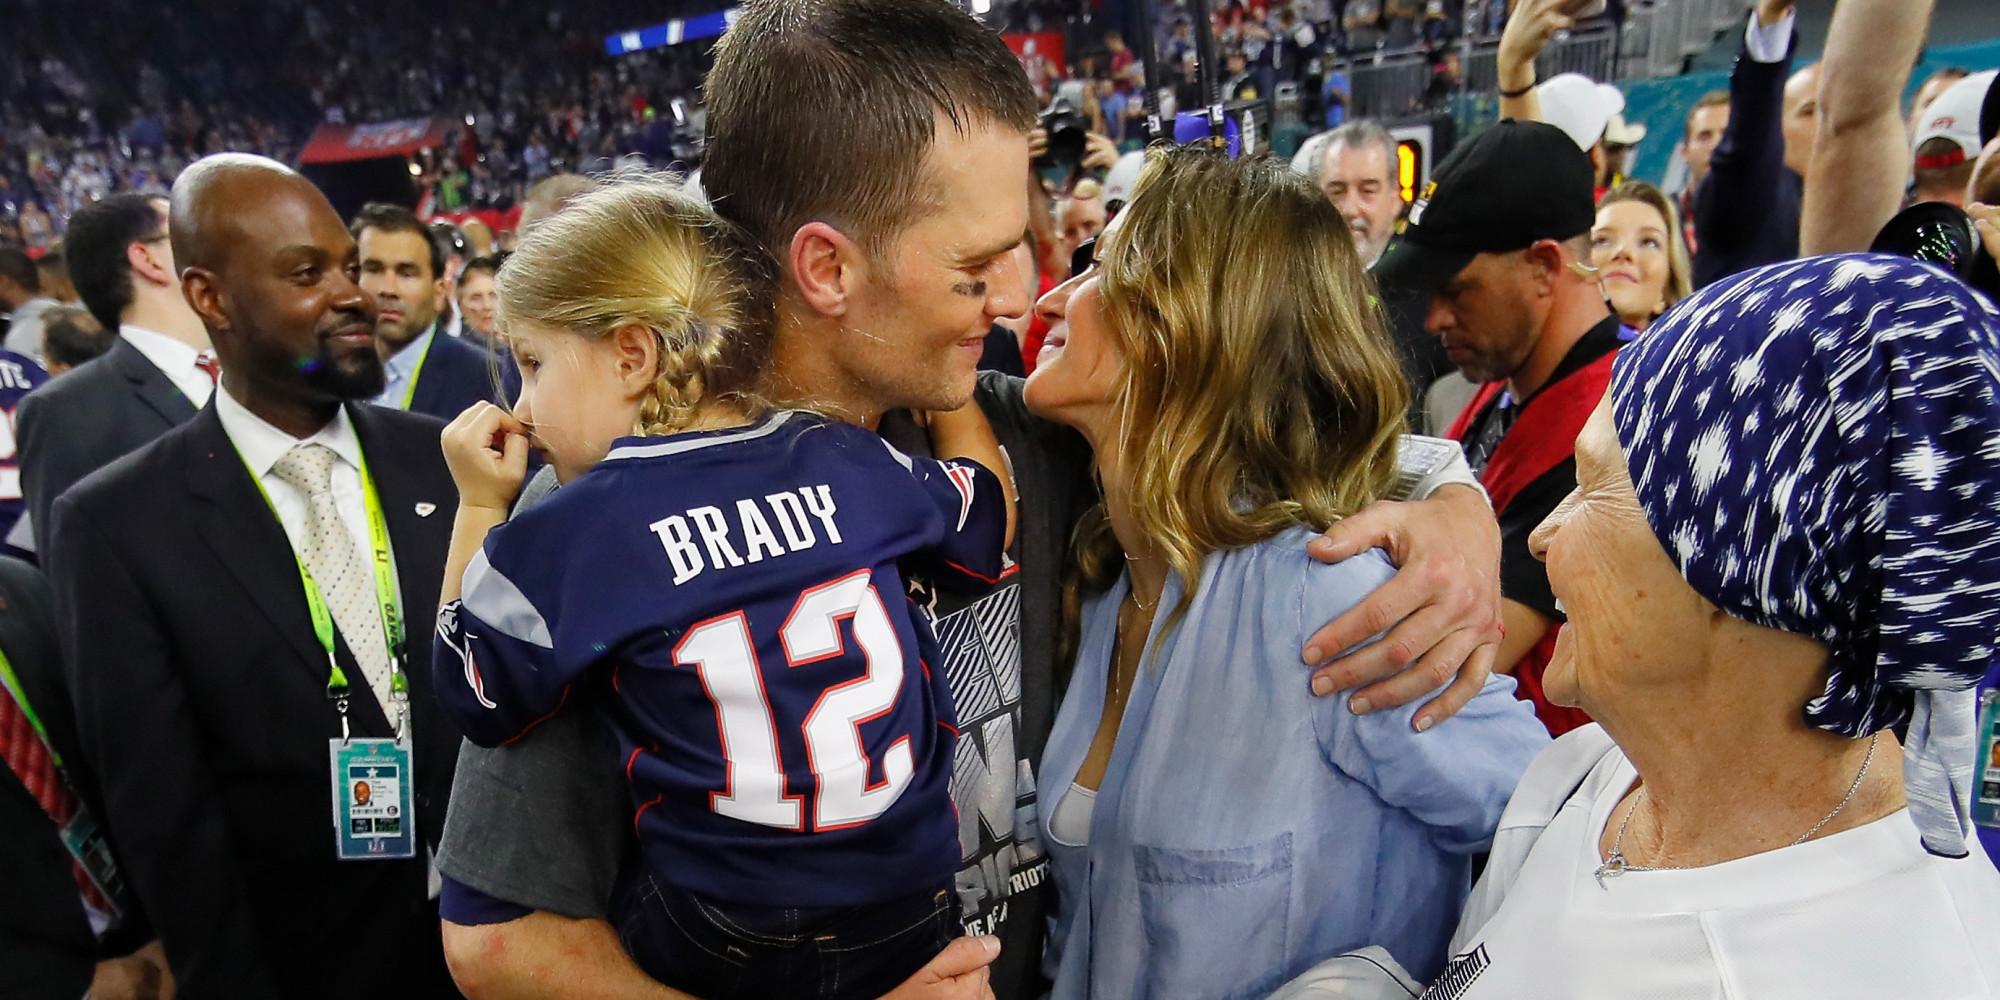 Gisele Bündchen Is Tom Brady's Number One Fan At Super Bowl LI Gisele Bundchen Facebook